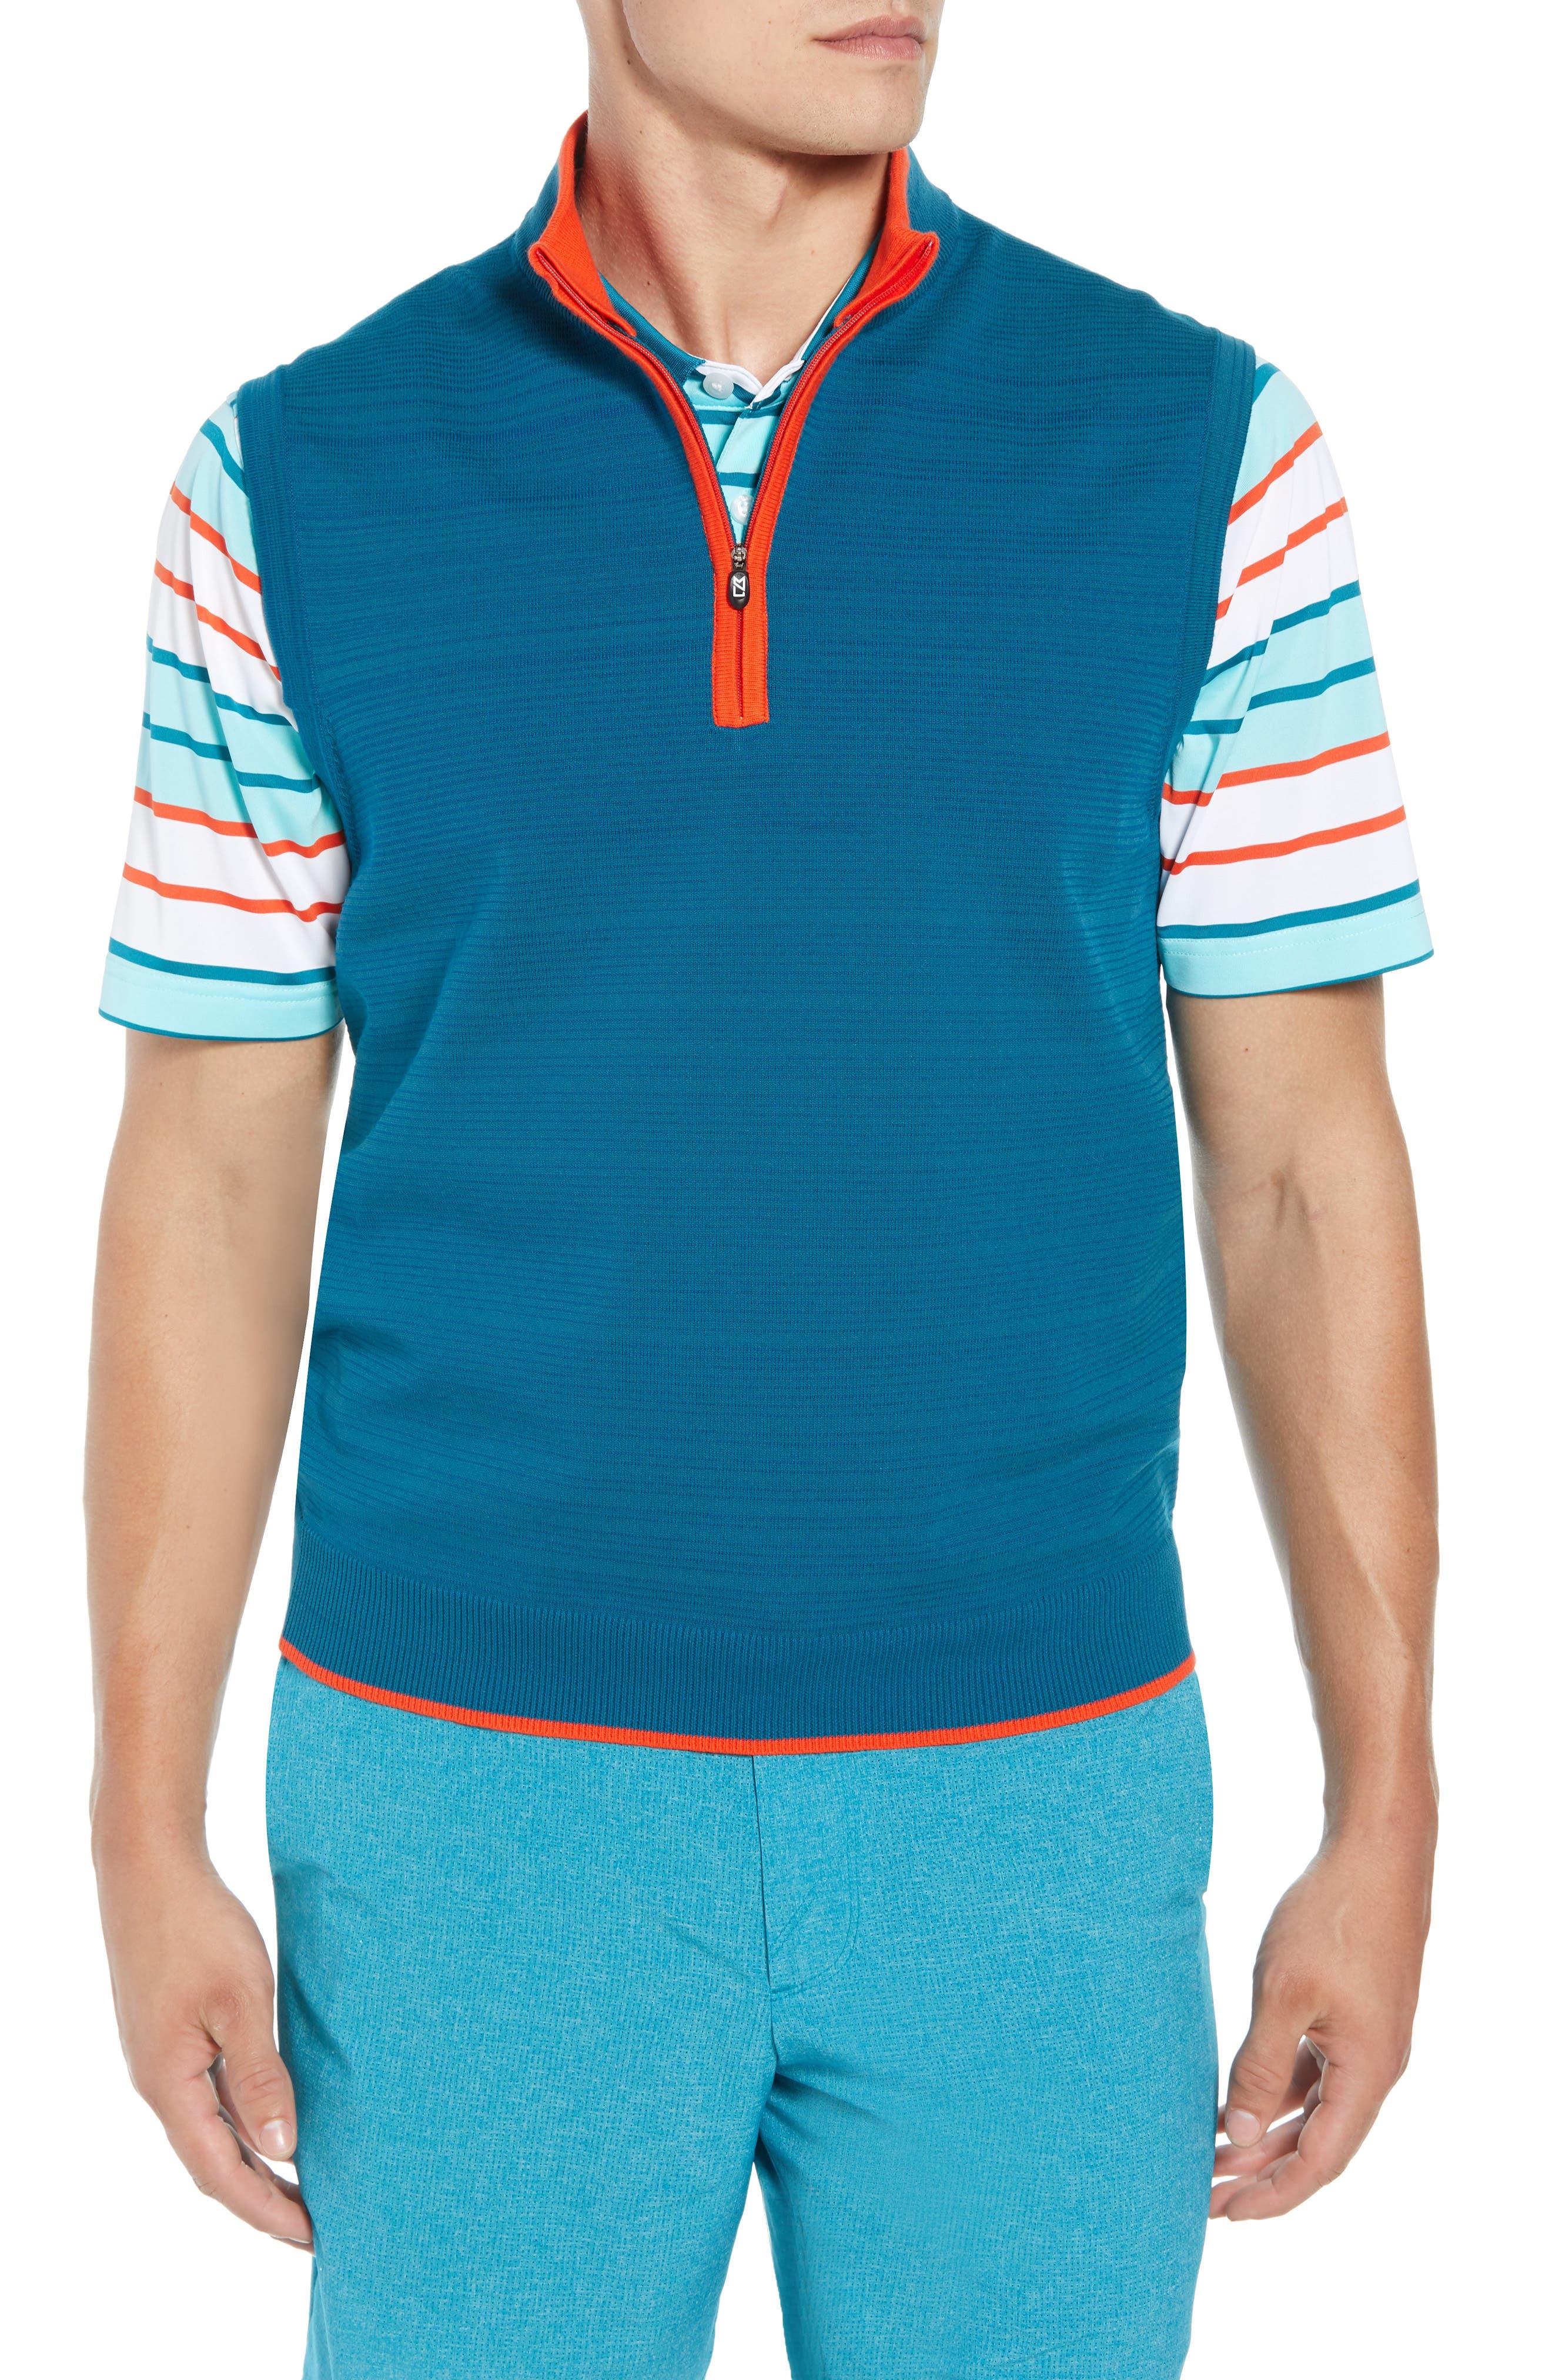 Cutter & Buck Impact Half Zip Sweater Vest, Blue